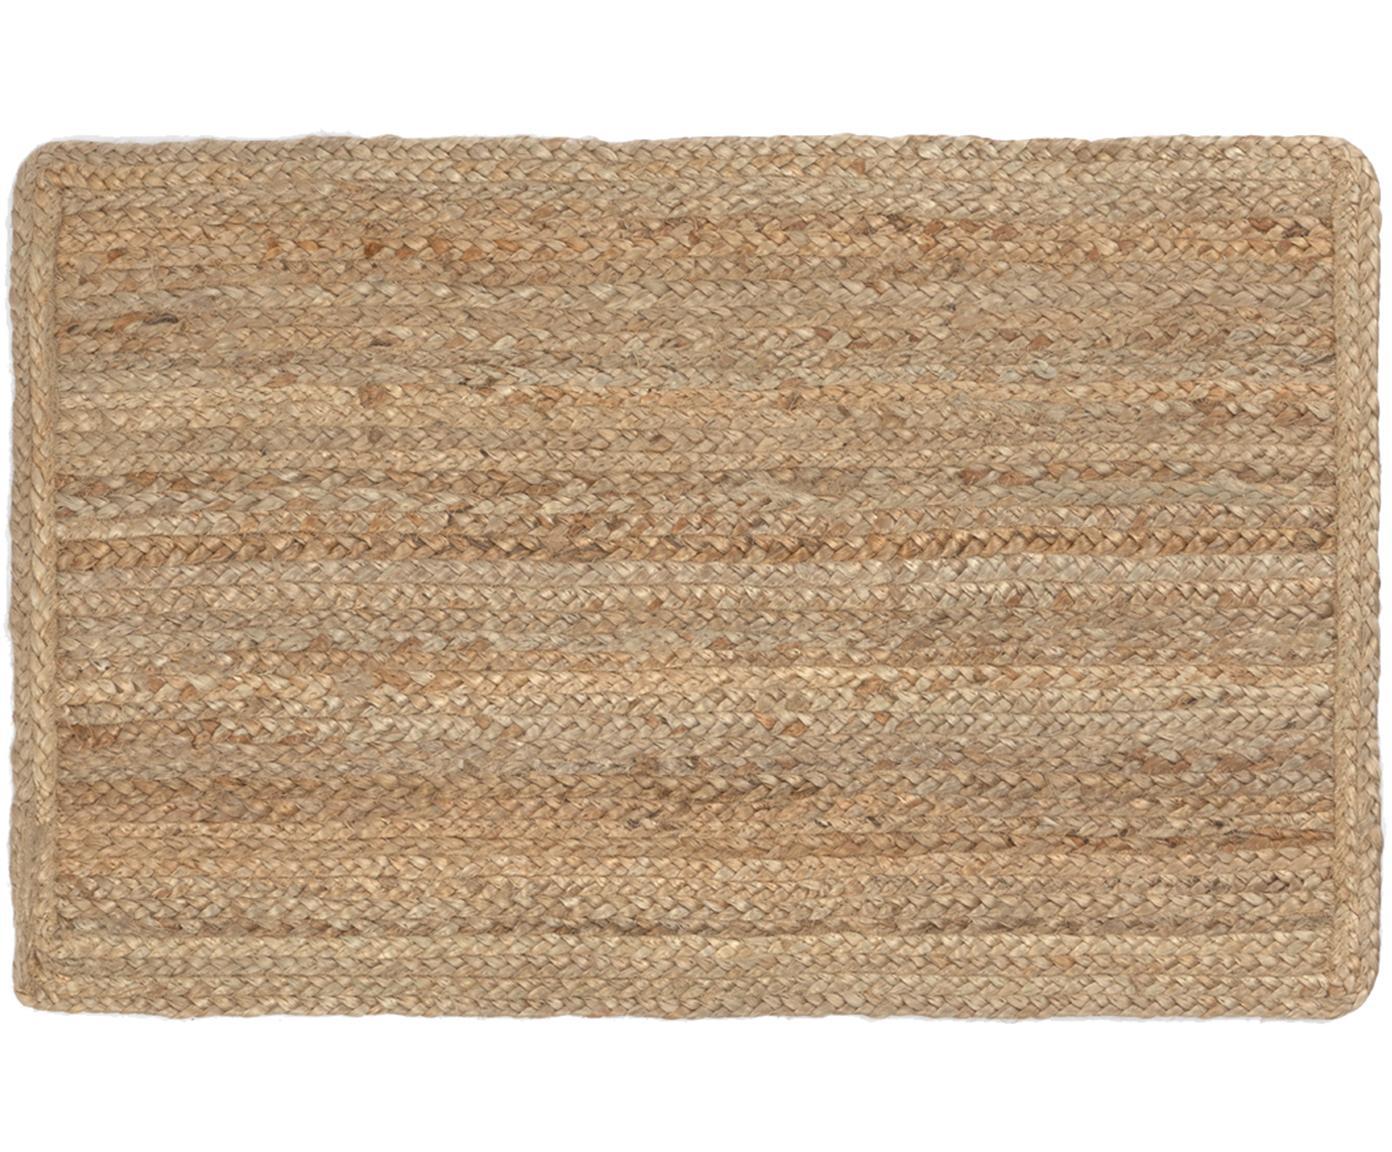 Felpudo de yute Ural, Yute, Beige, An 45 x L 75 cm